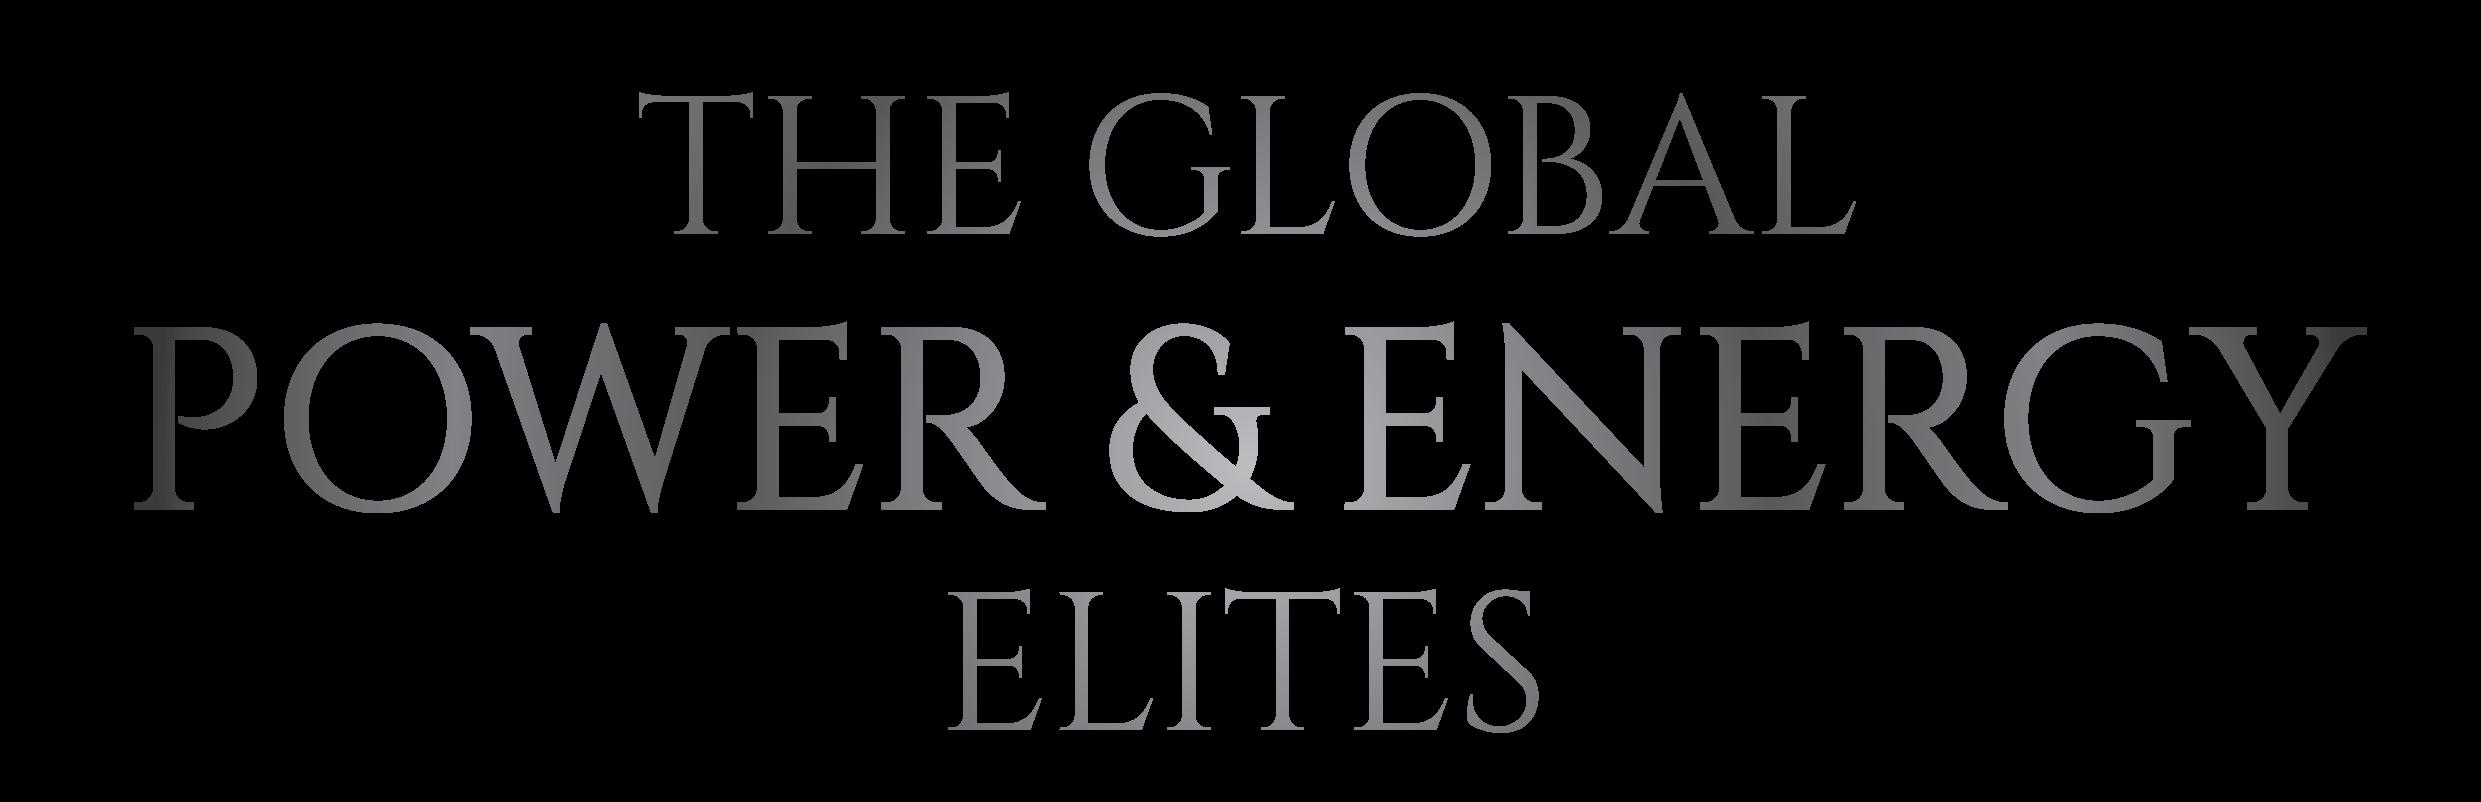 The Global Power & Energy Elites